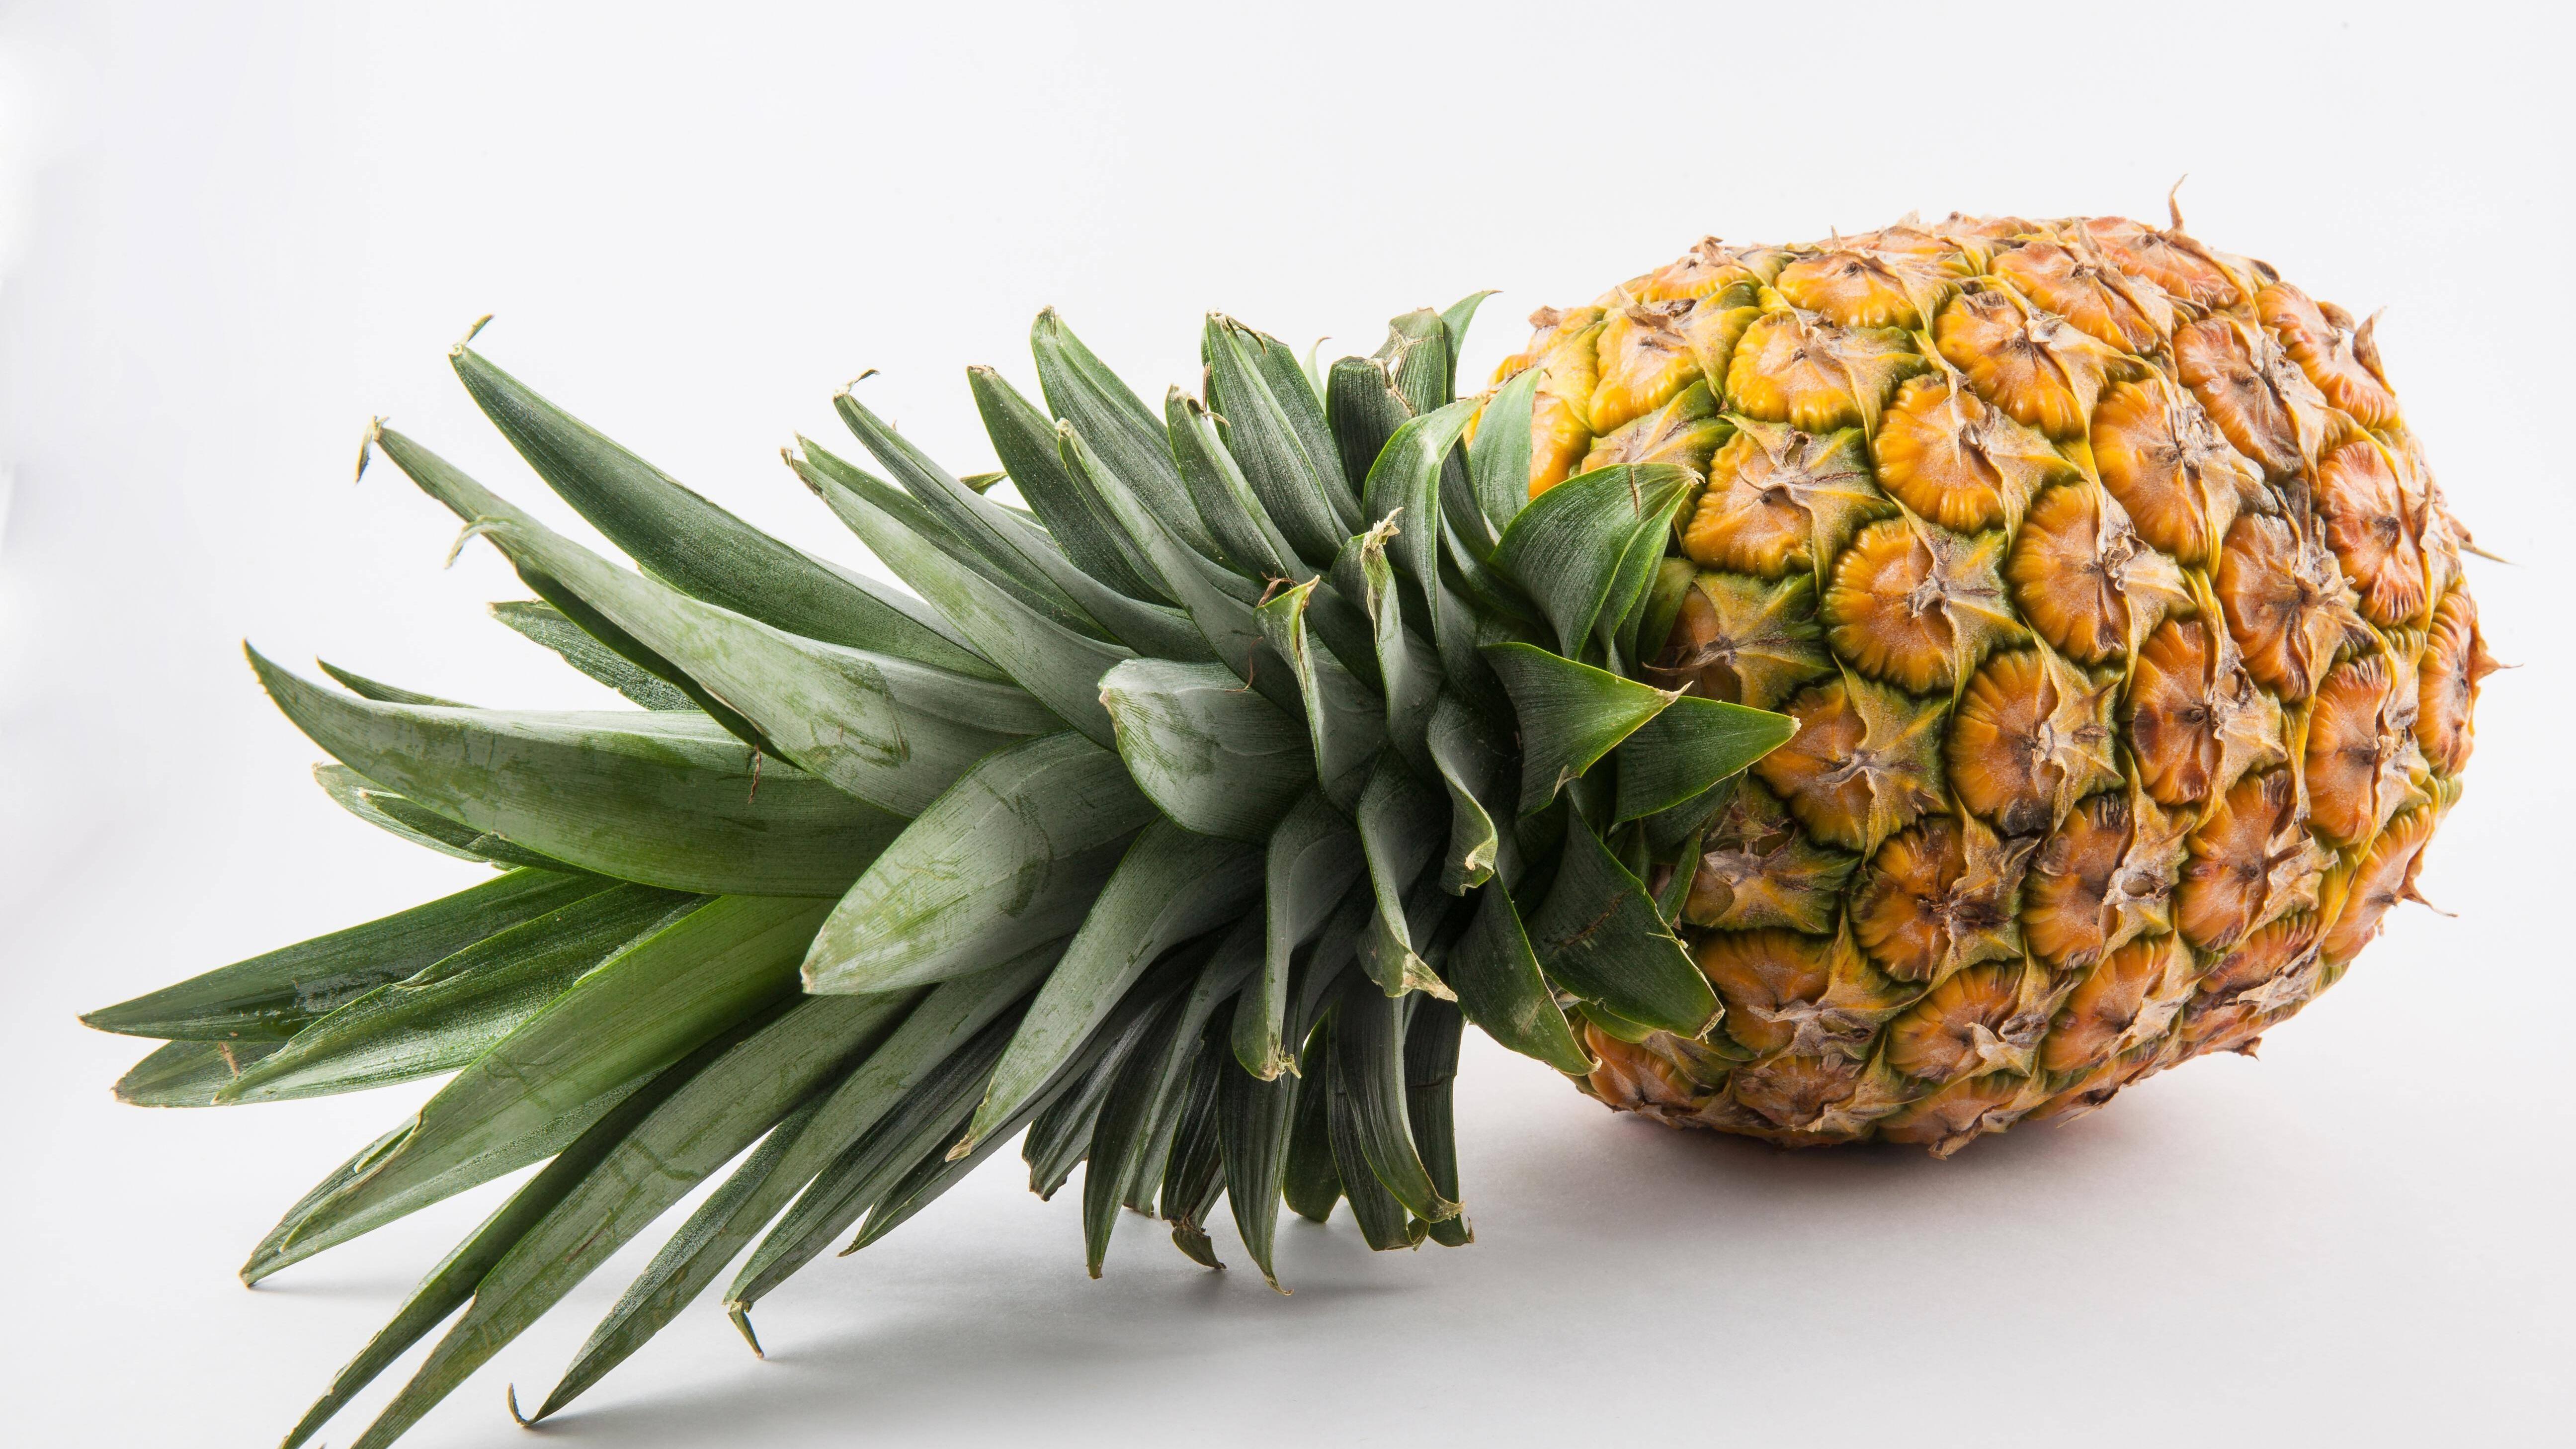 Ananas richtig essen: So klappt's